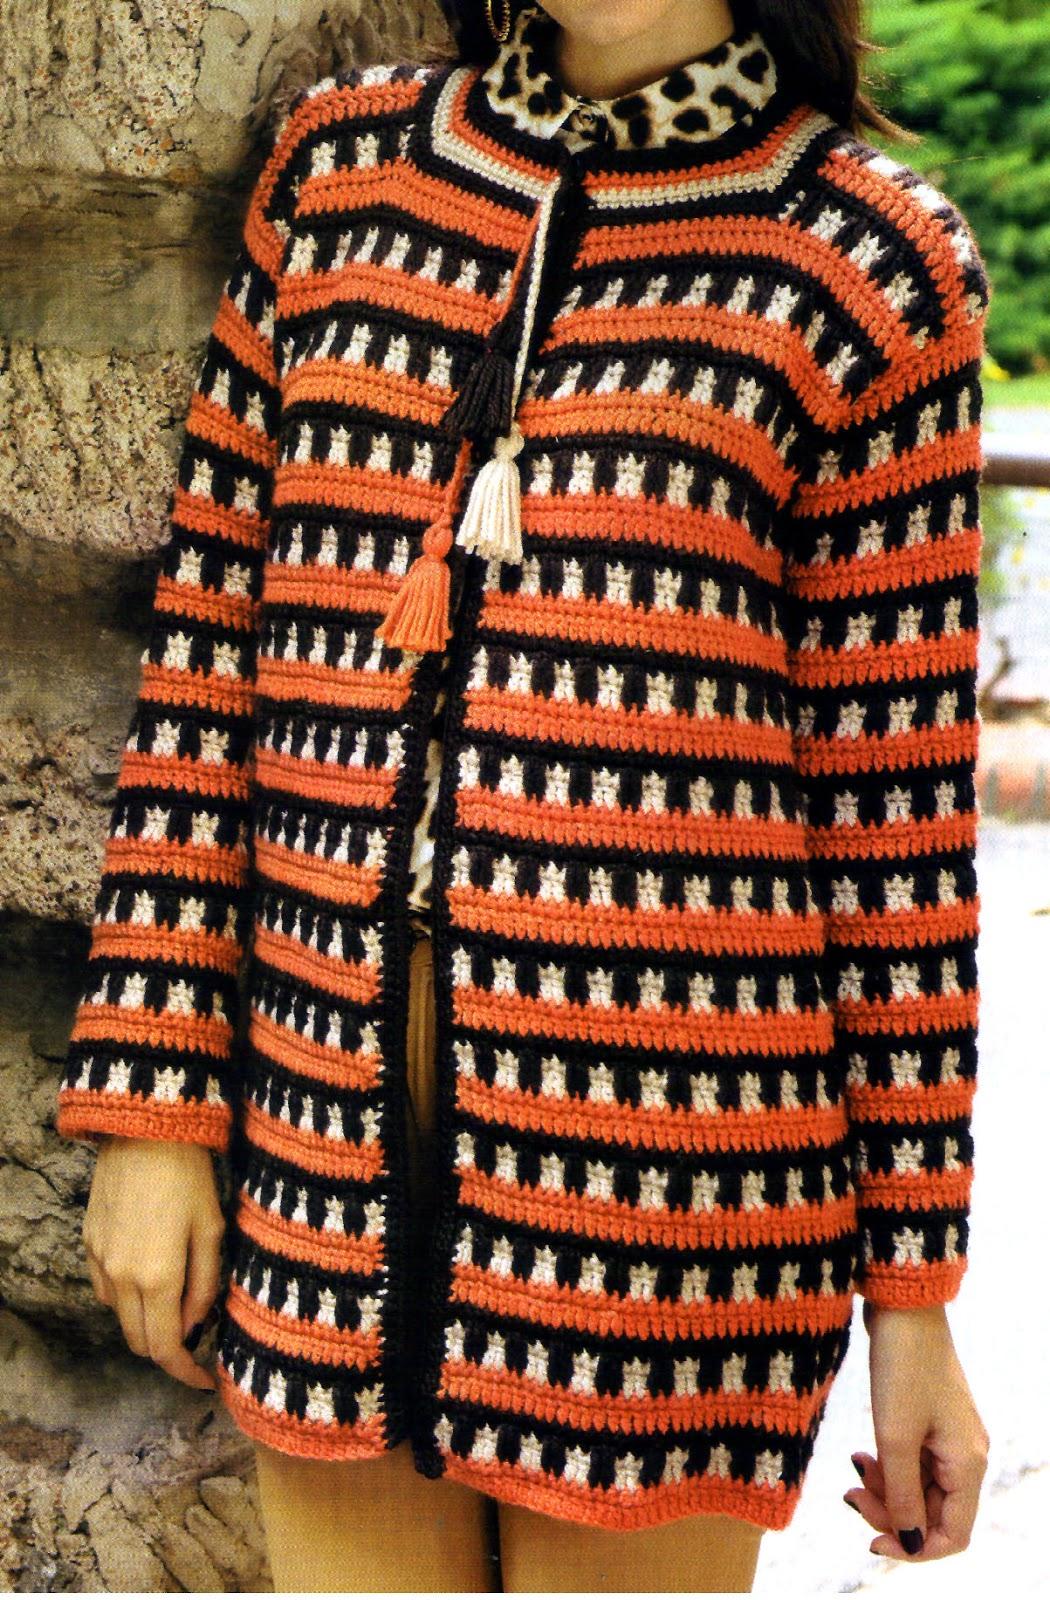 saco entramado tejido en crochet (frente)